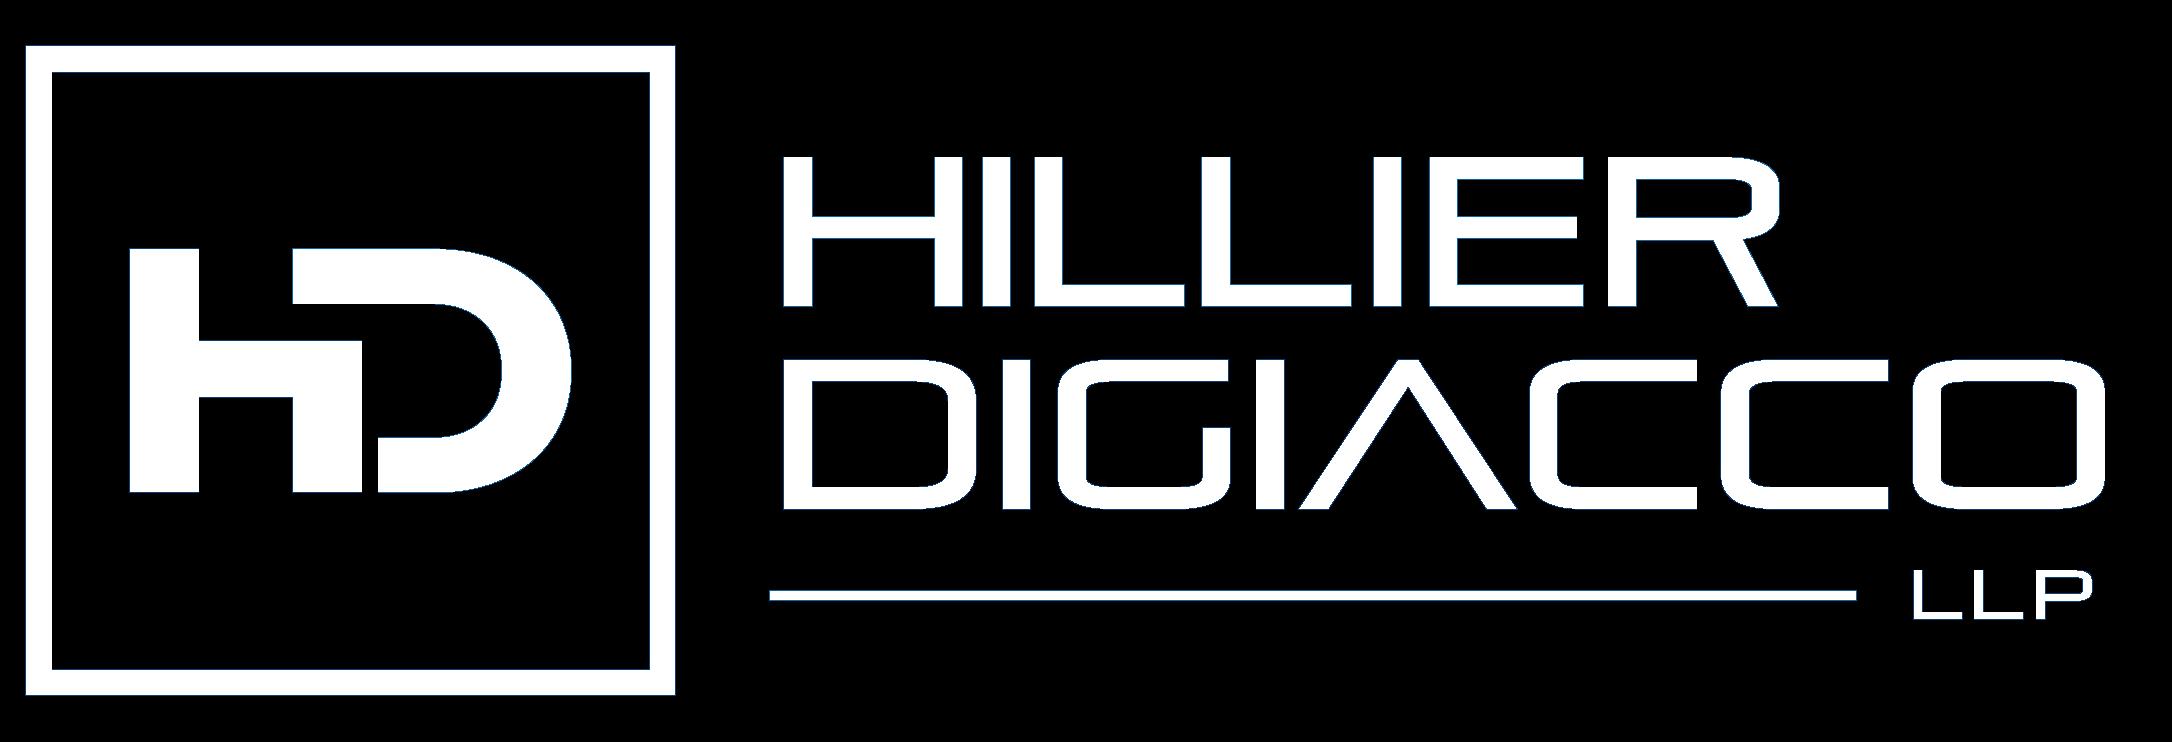 Hillier DiGiacco LLP